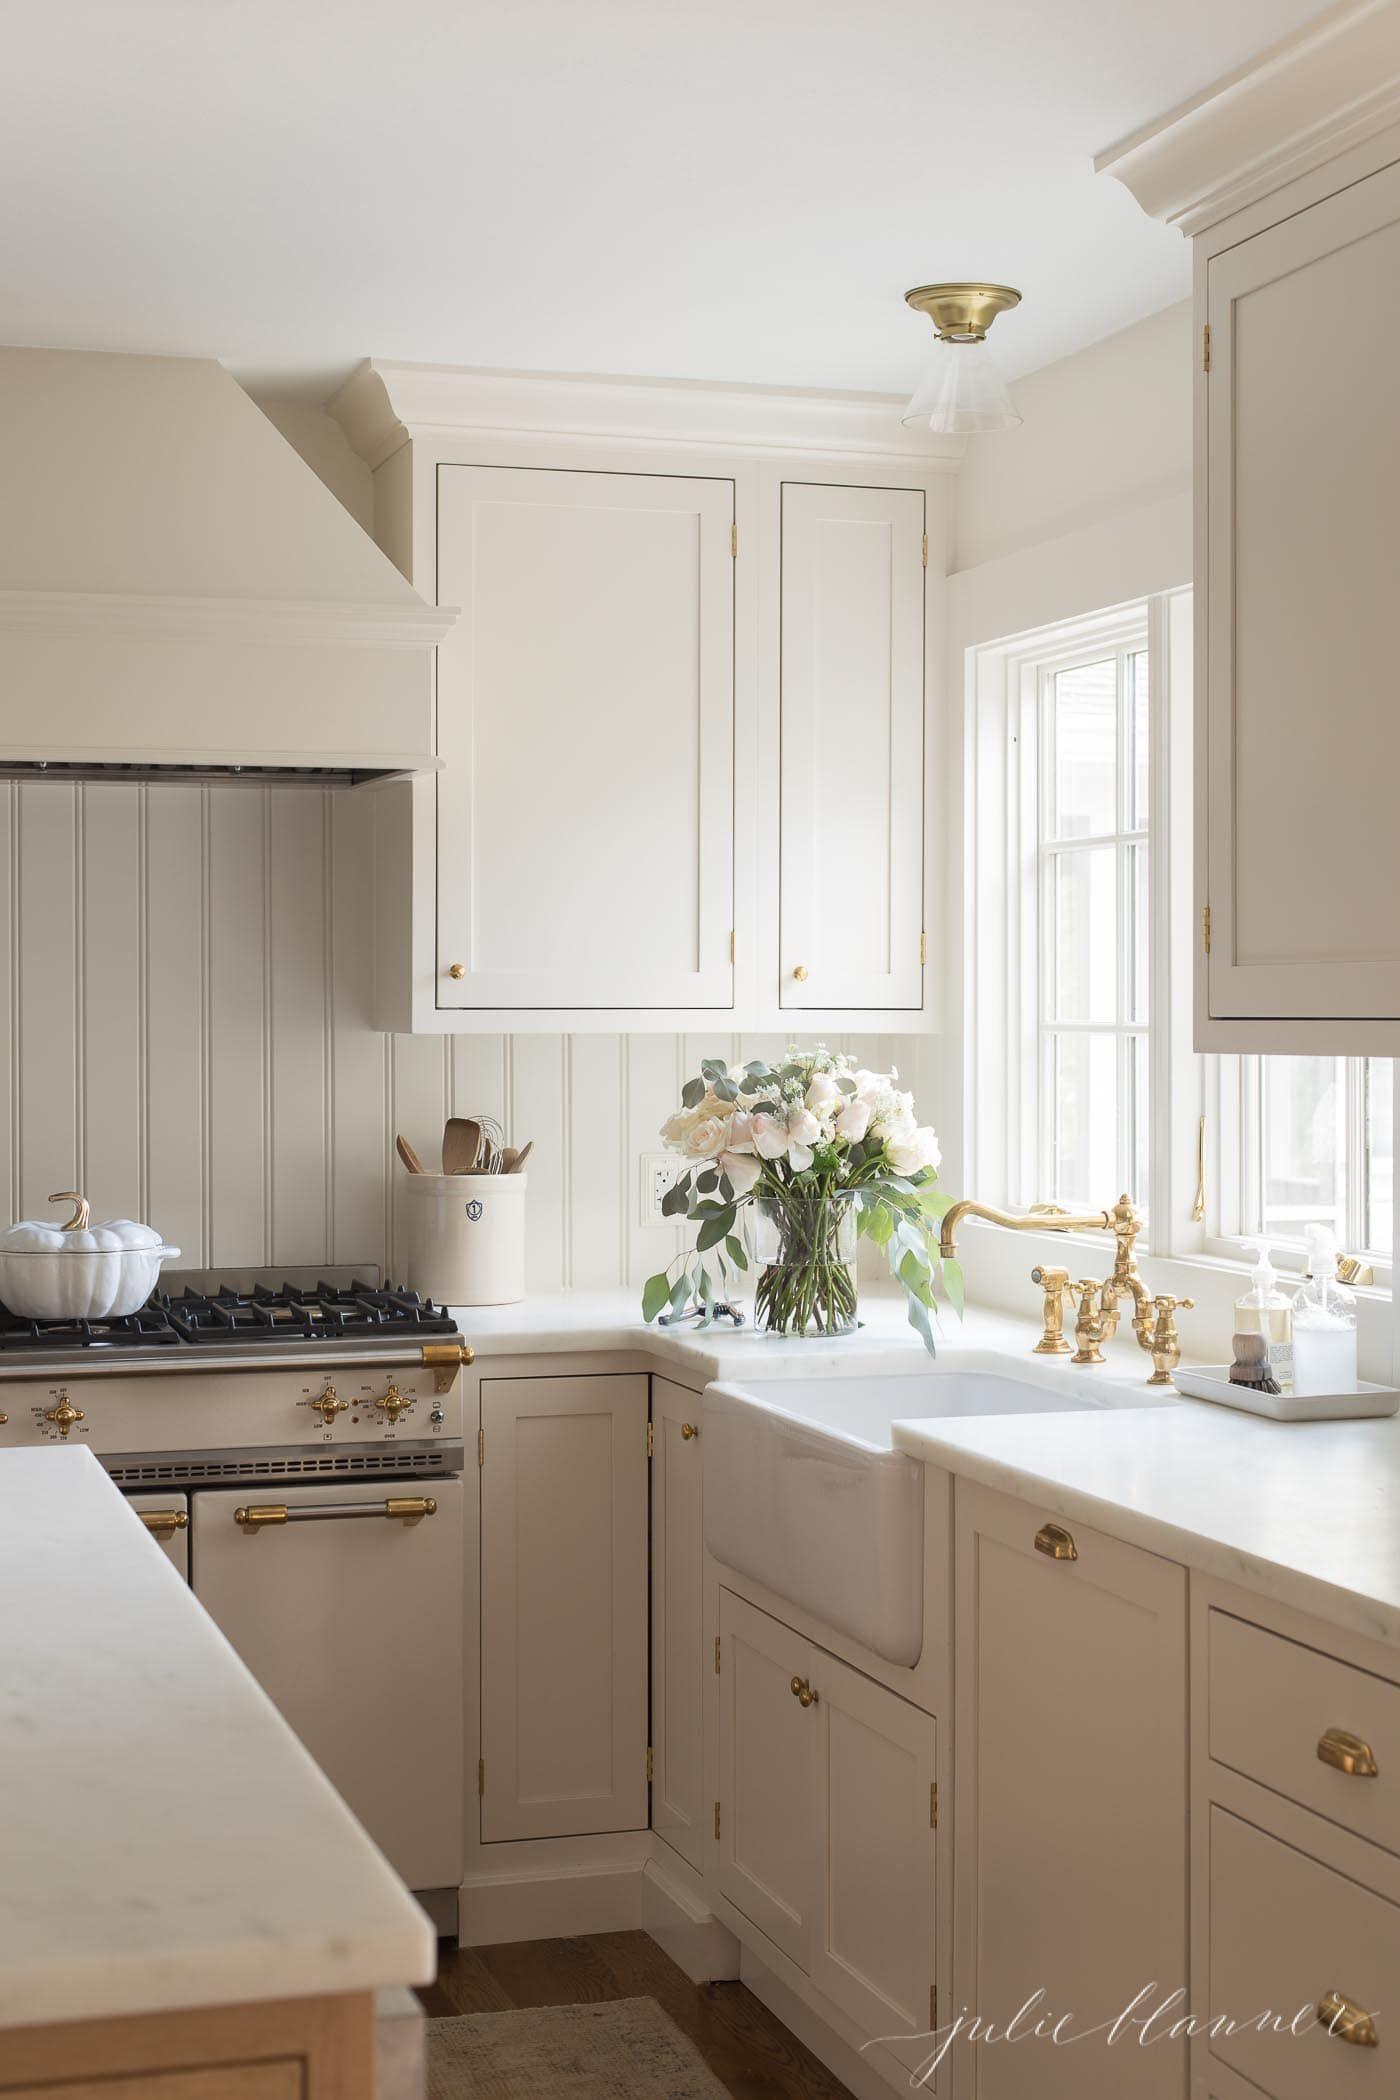 Cream Kitchen Cabinets The Prettiest Paint Color For Cream Kitchen